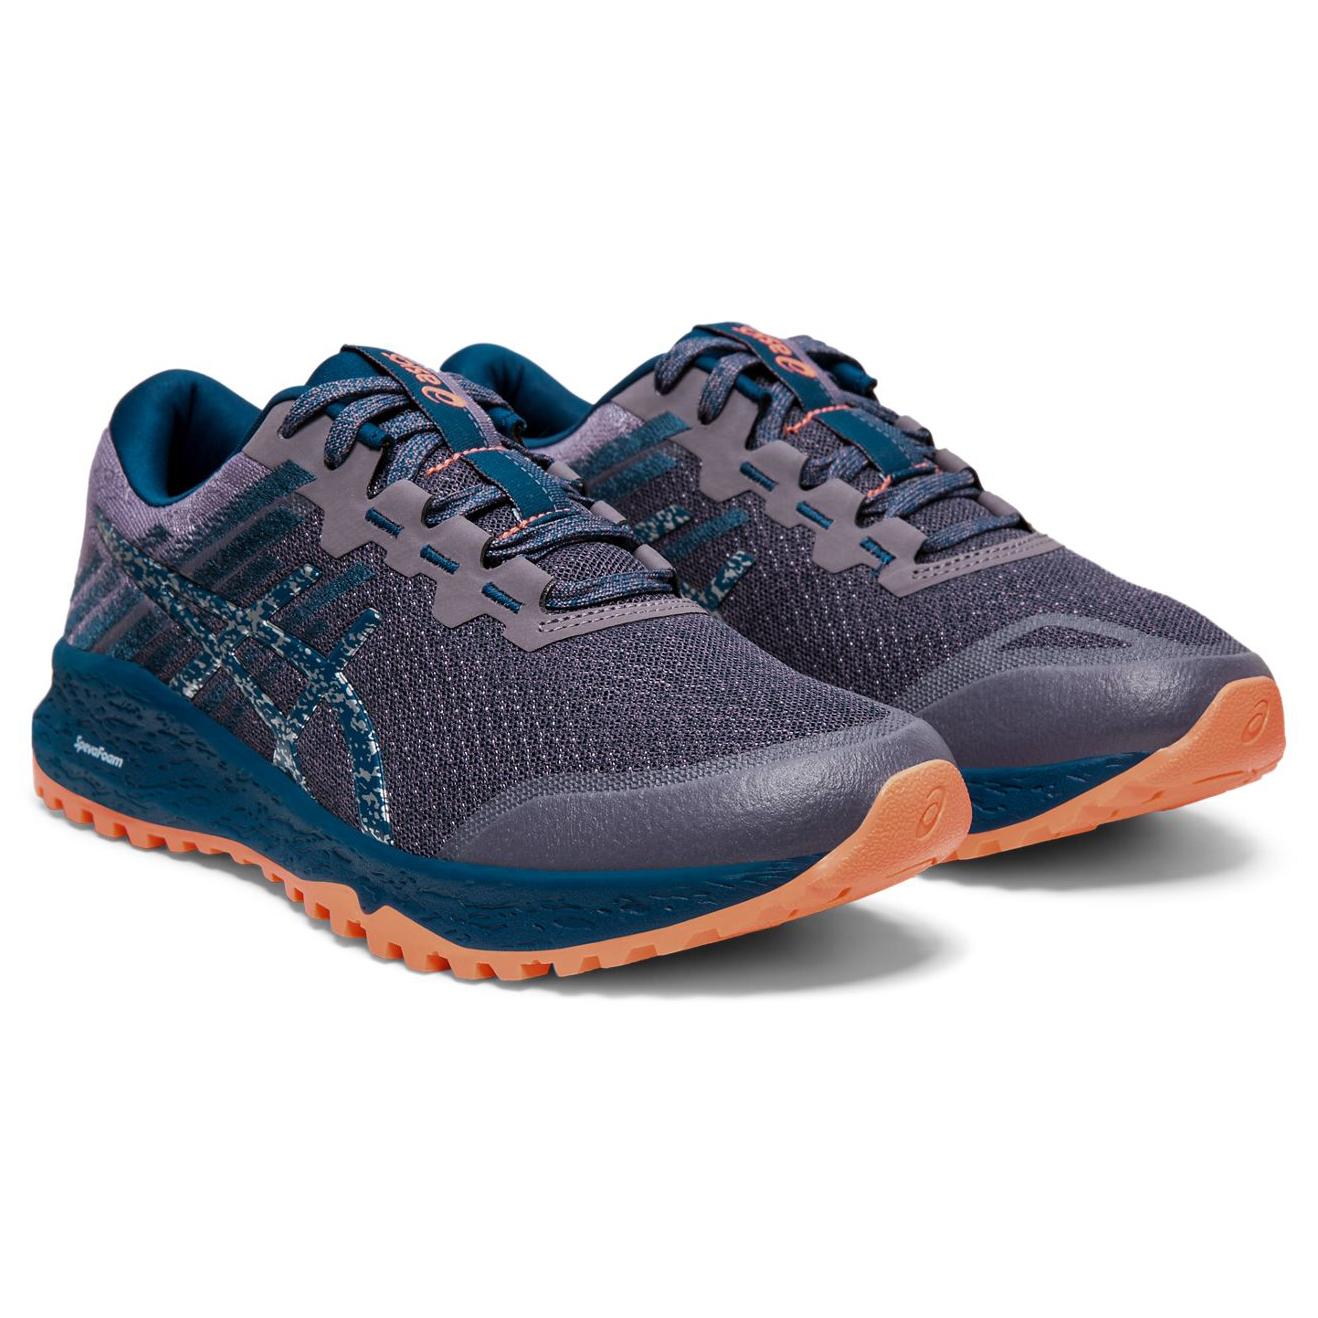 Asics Alpine XT 2 - Trail running shoes Women's | Buy online ...